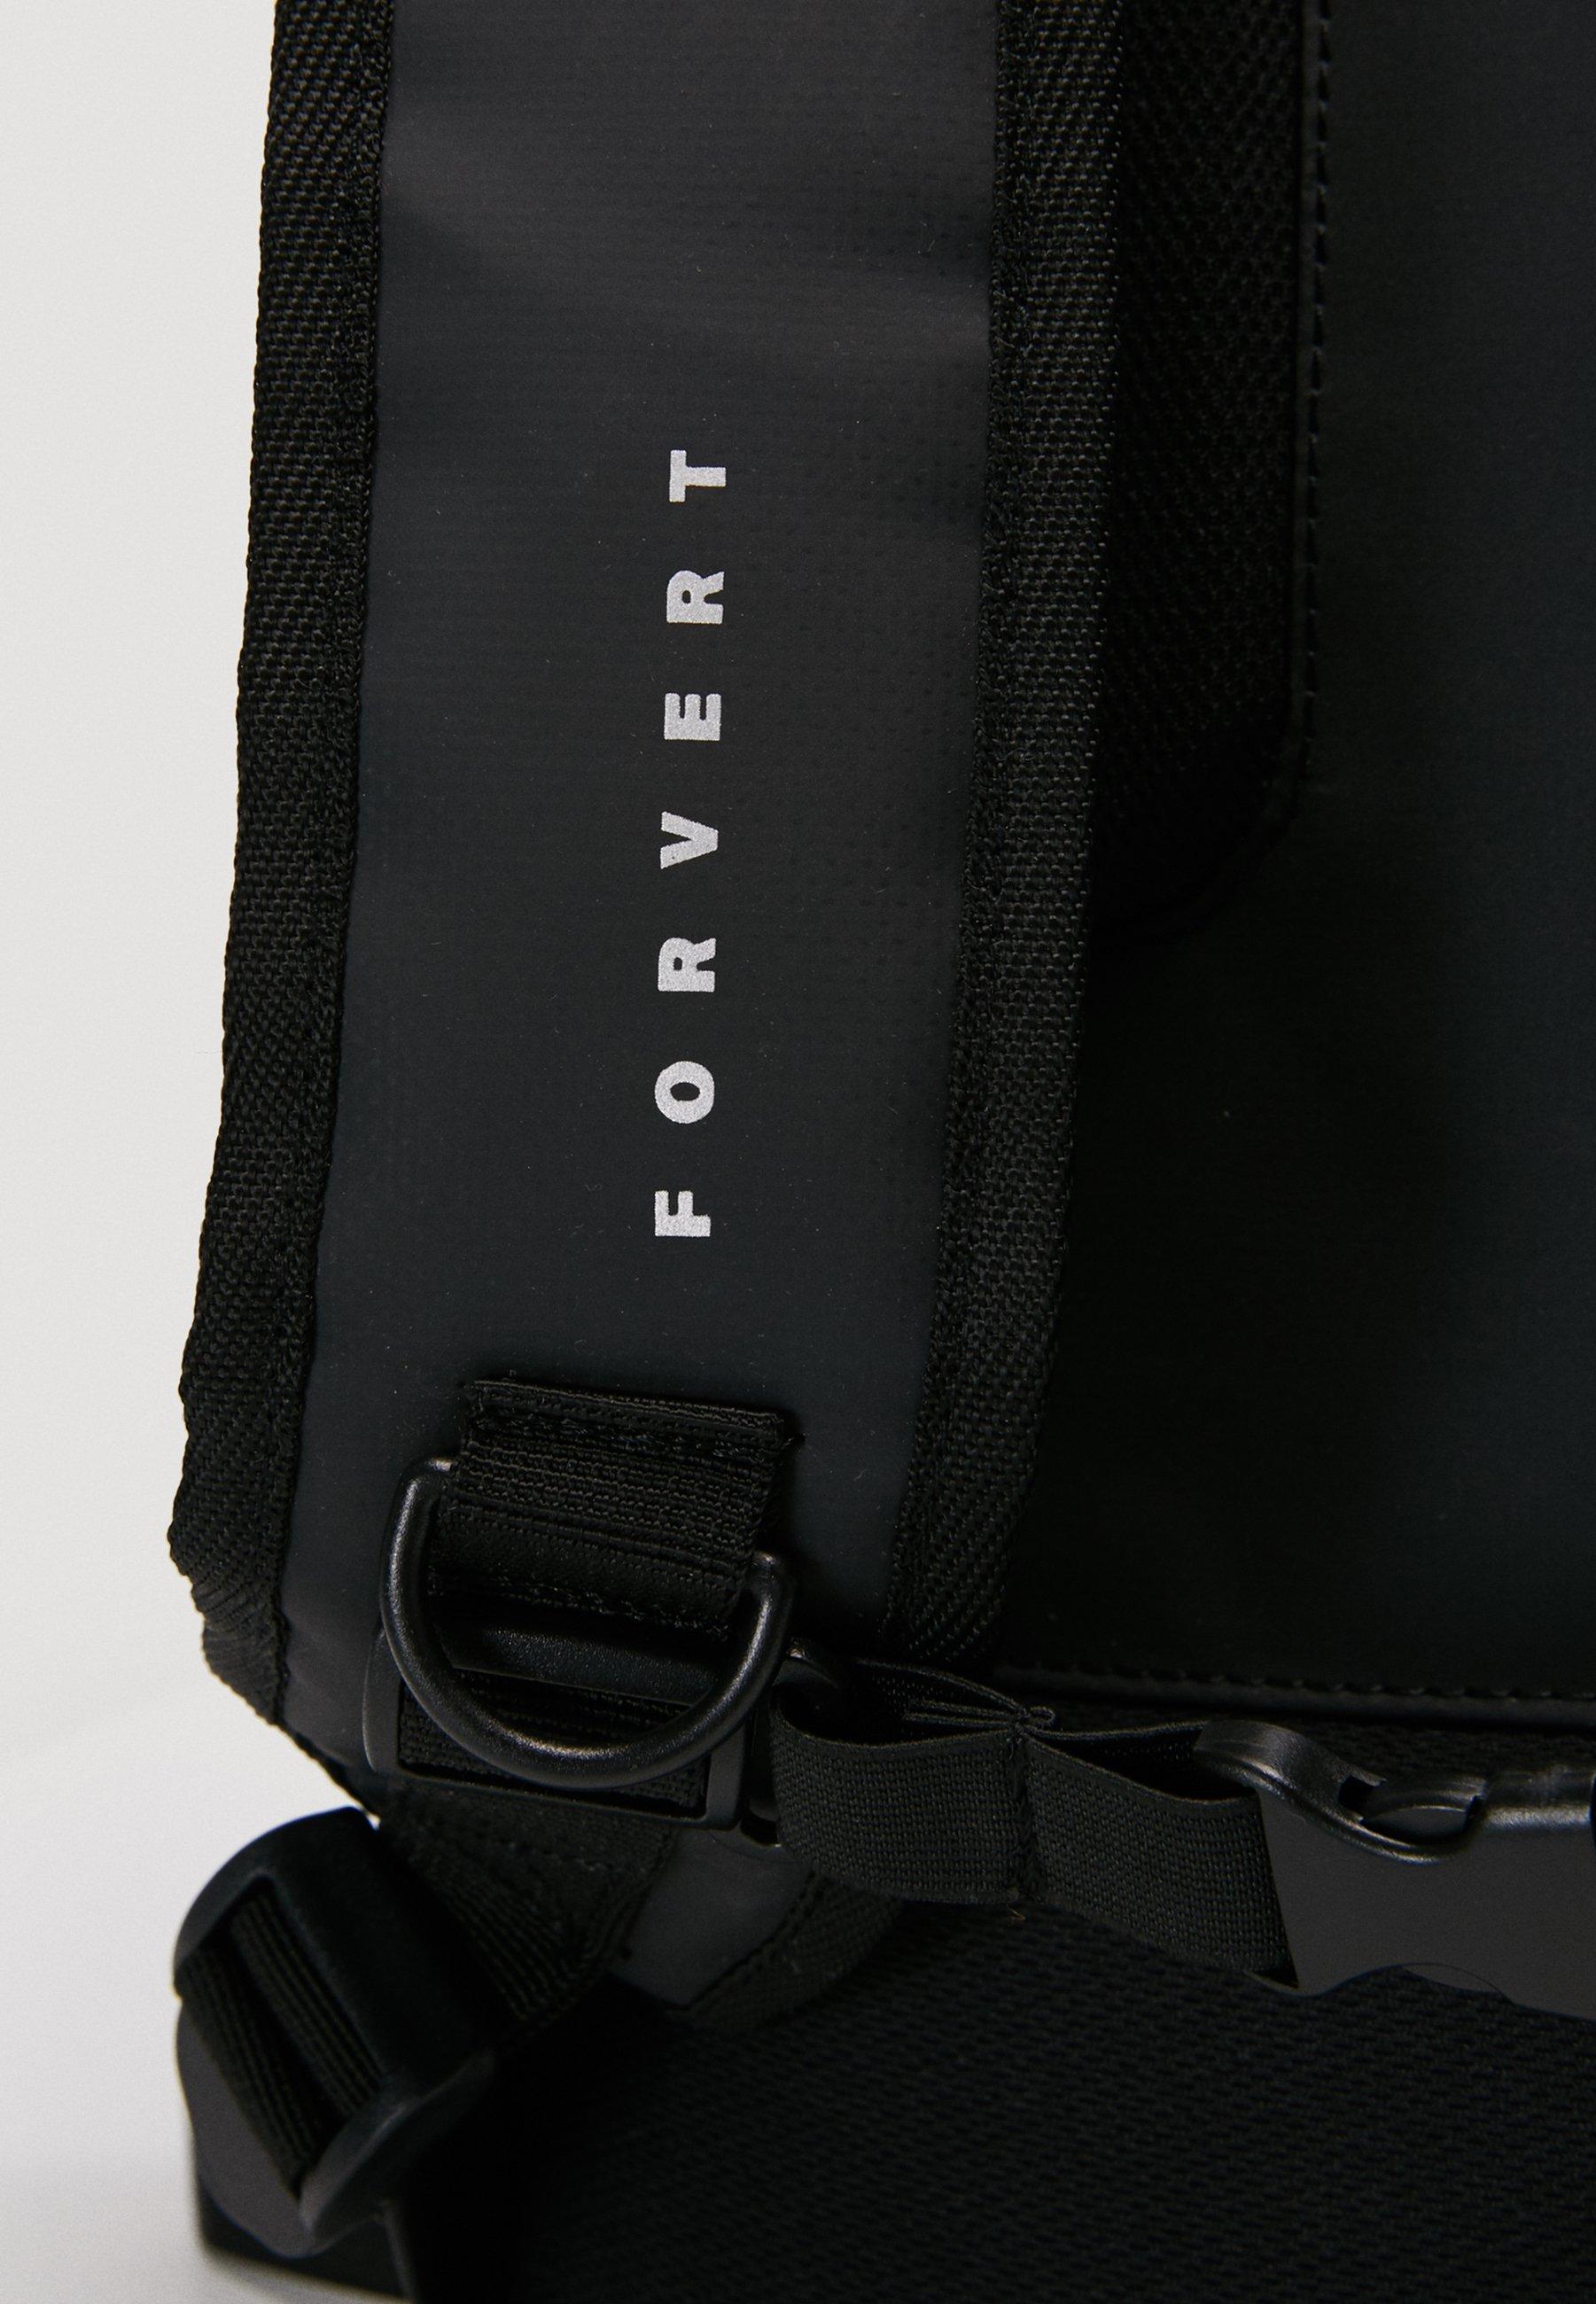 Forvert TARP LORENZ - Tagesrucksack - black/schwarz - Herrentaschen wcU8U